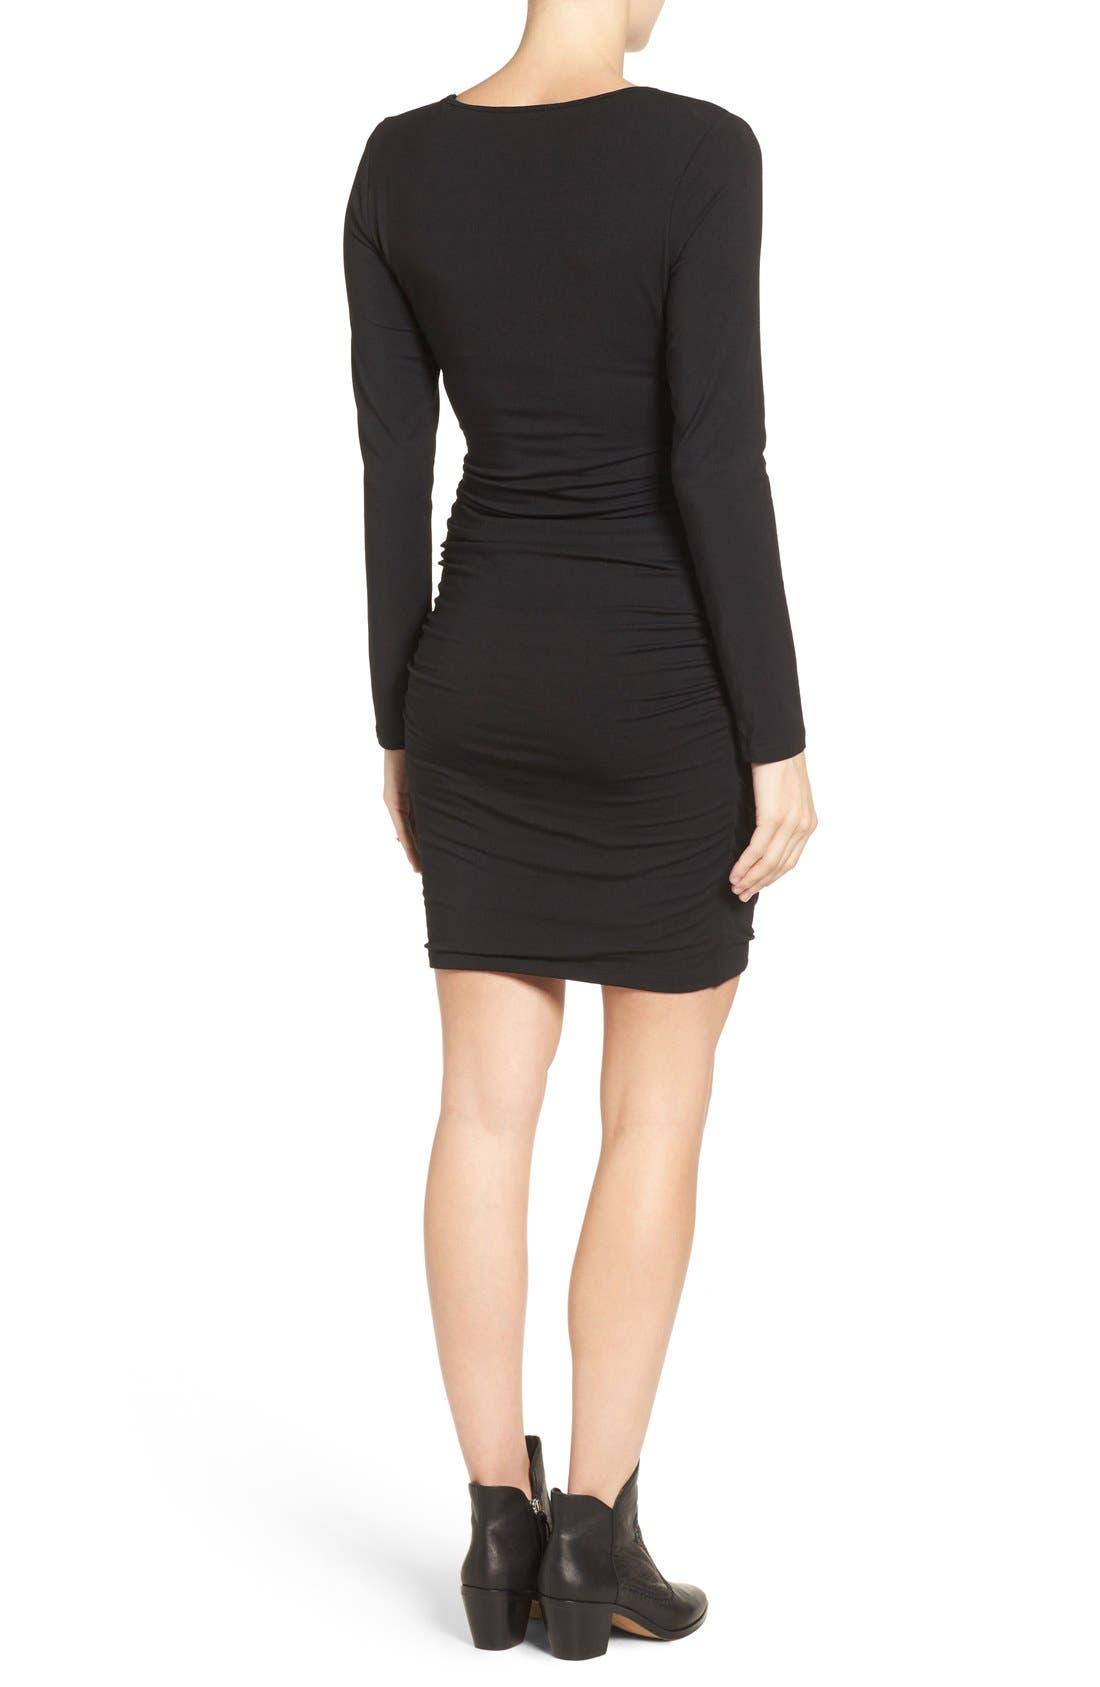 Tart 'Peaches' Maternity Body-Con Dress,                         Main,                         color, BLACK